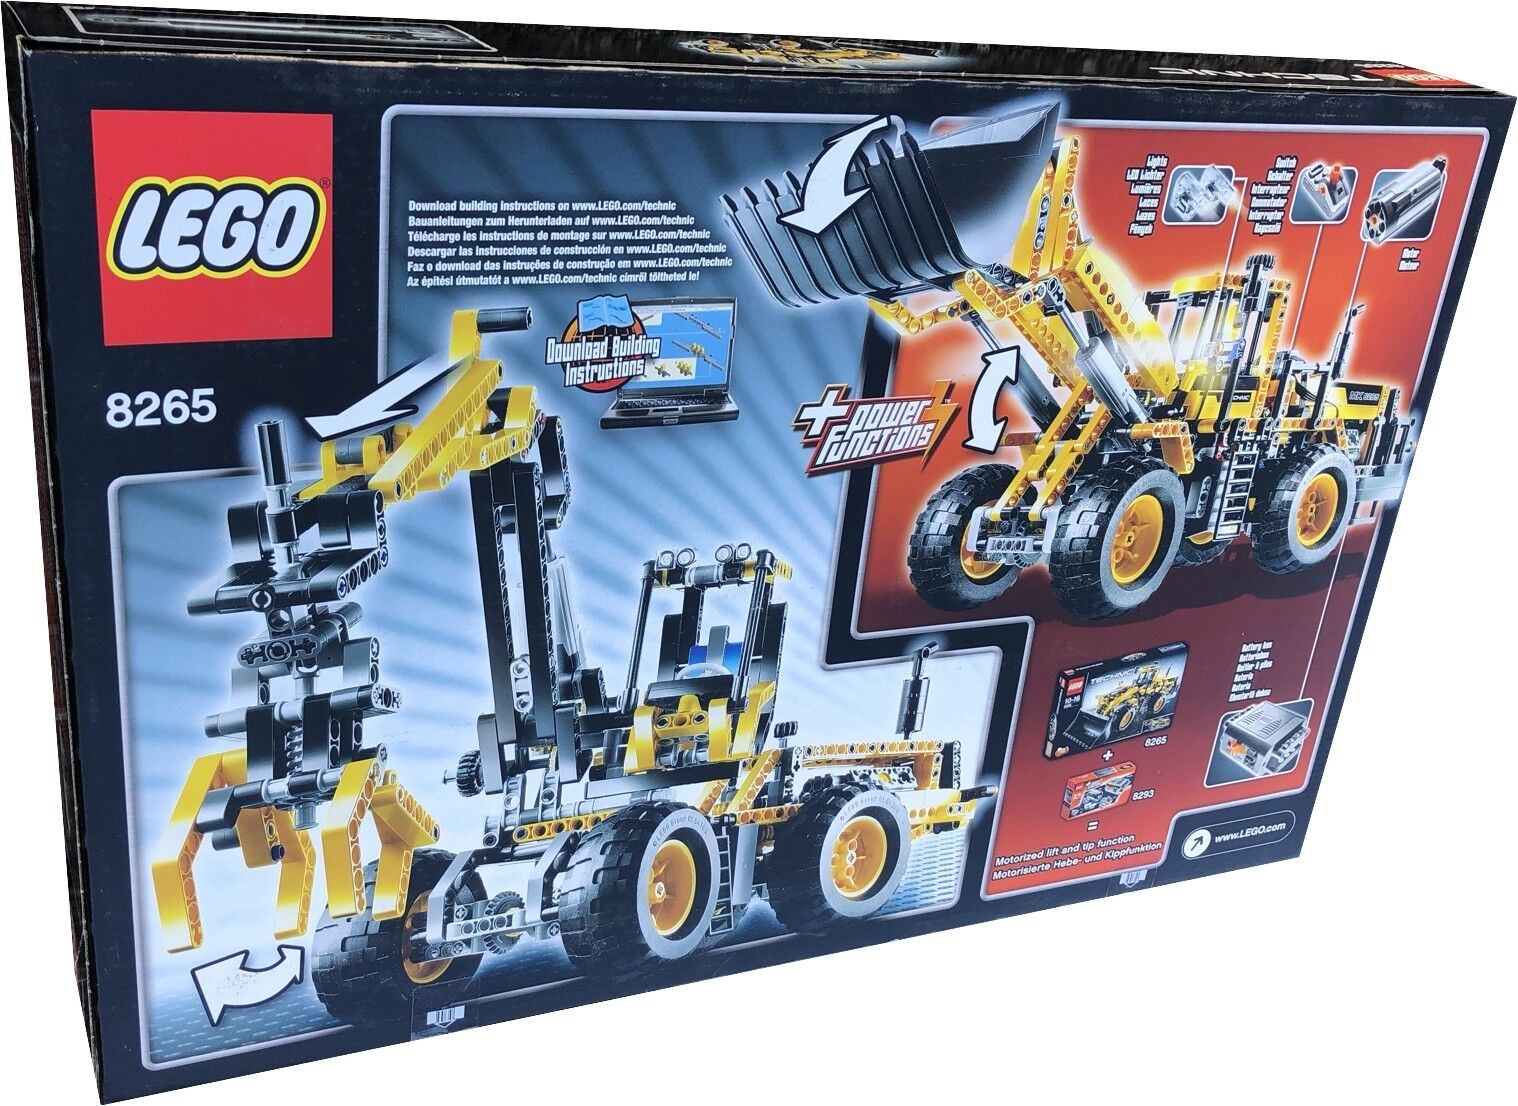 LEGO ® 8265 Technic Front Chargeur Chargeur Chargeur Chargeur NEUF  neuf dans sa boîte | Valeur Formidable  1cf49d